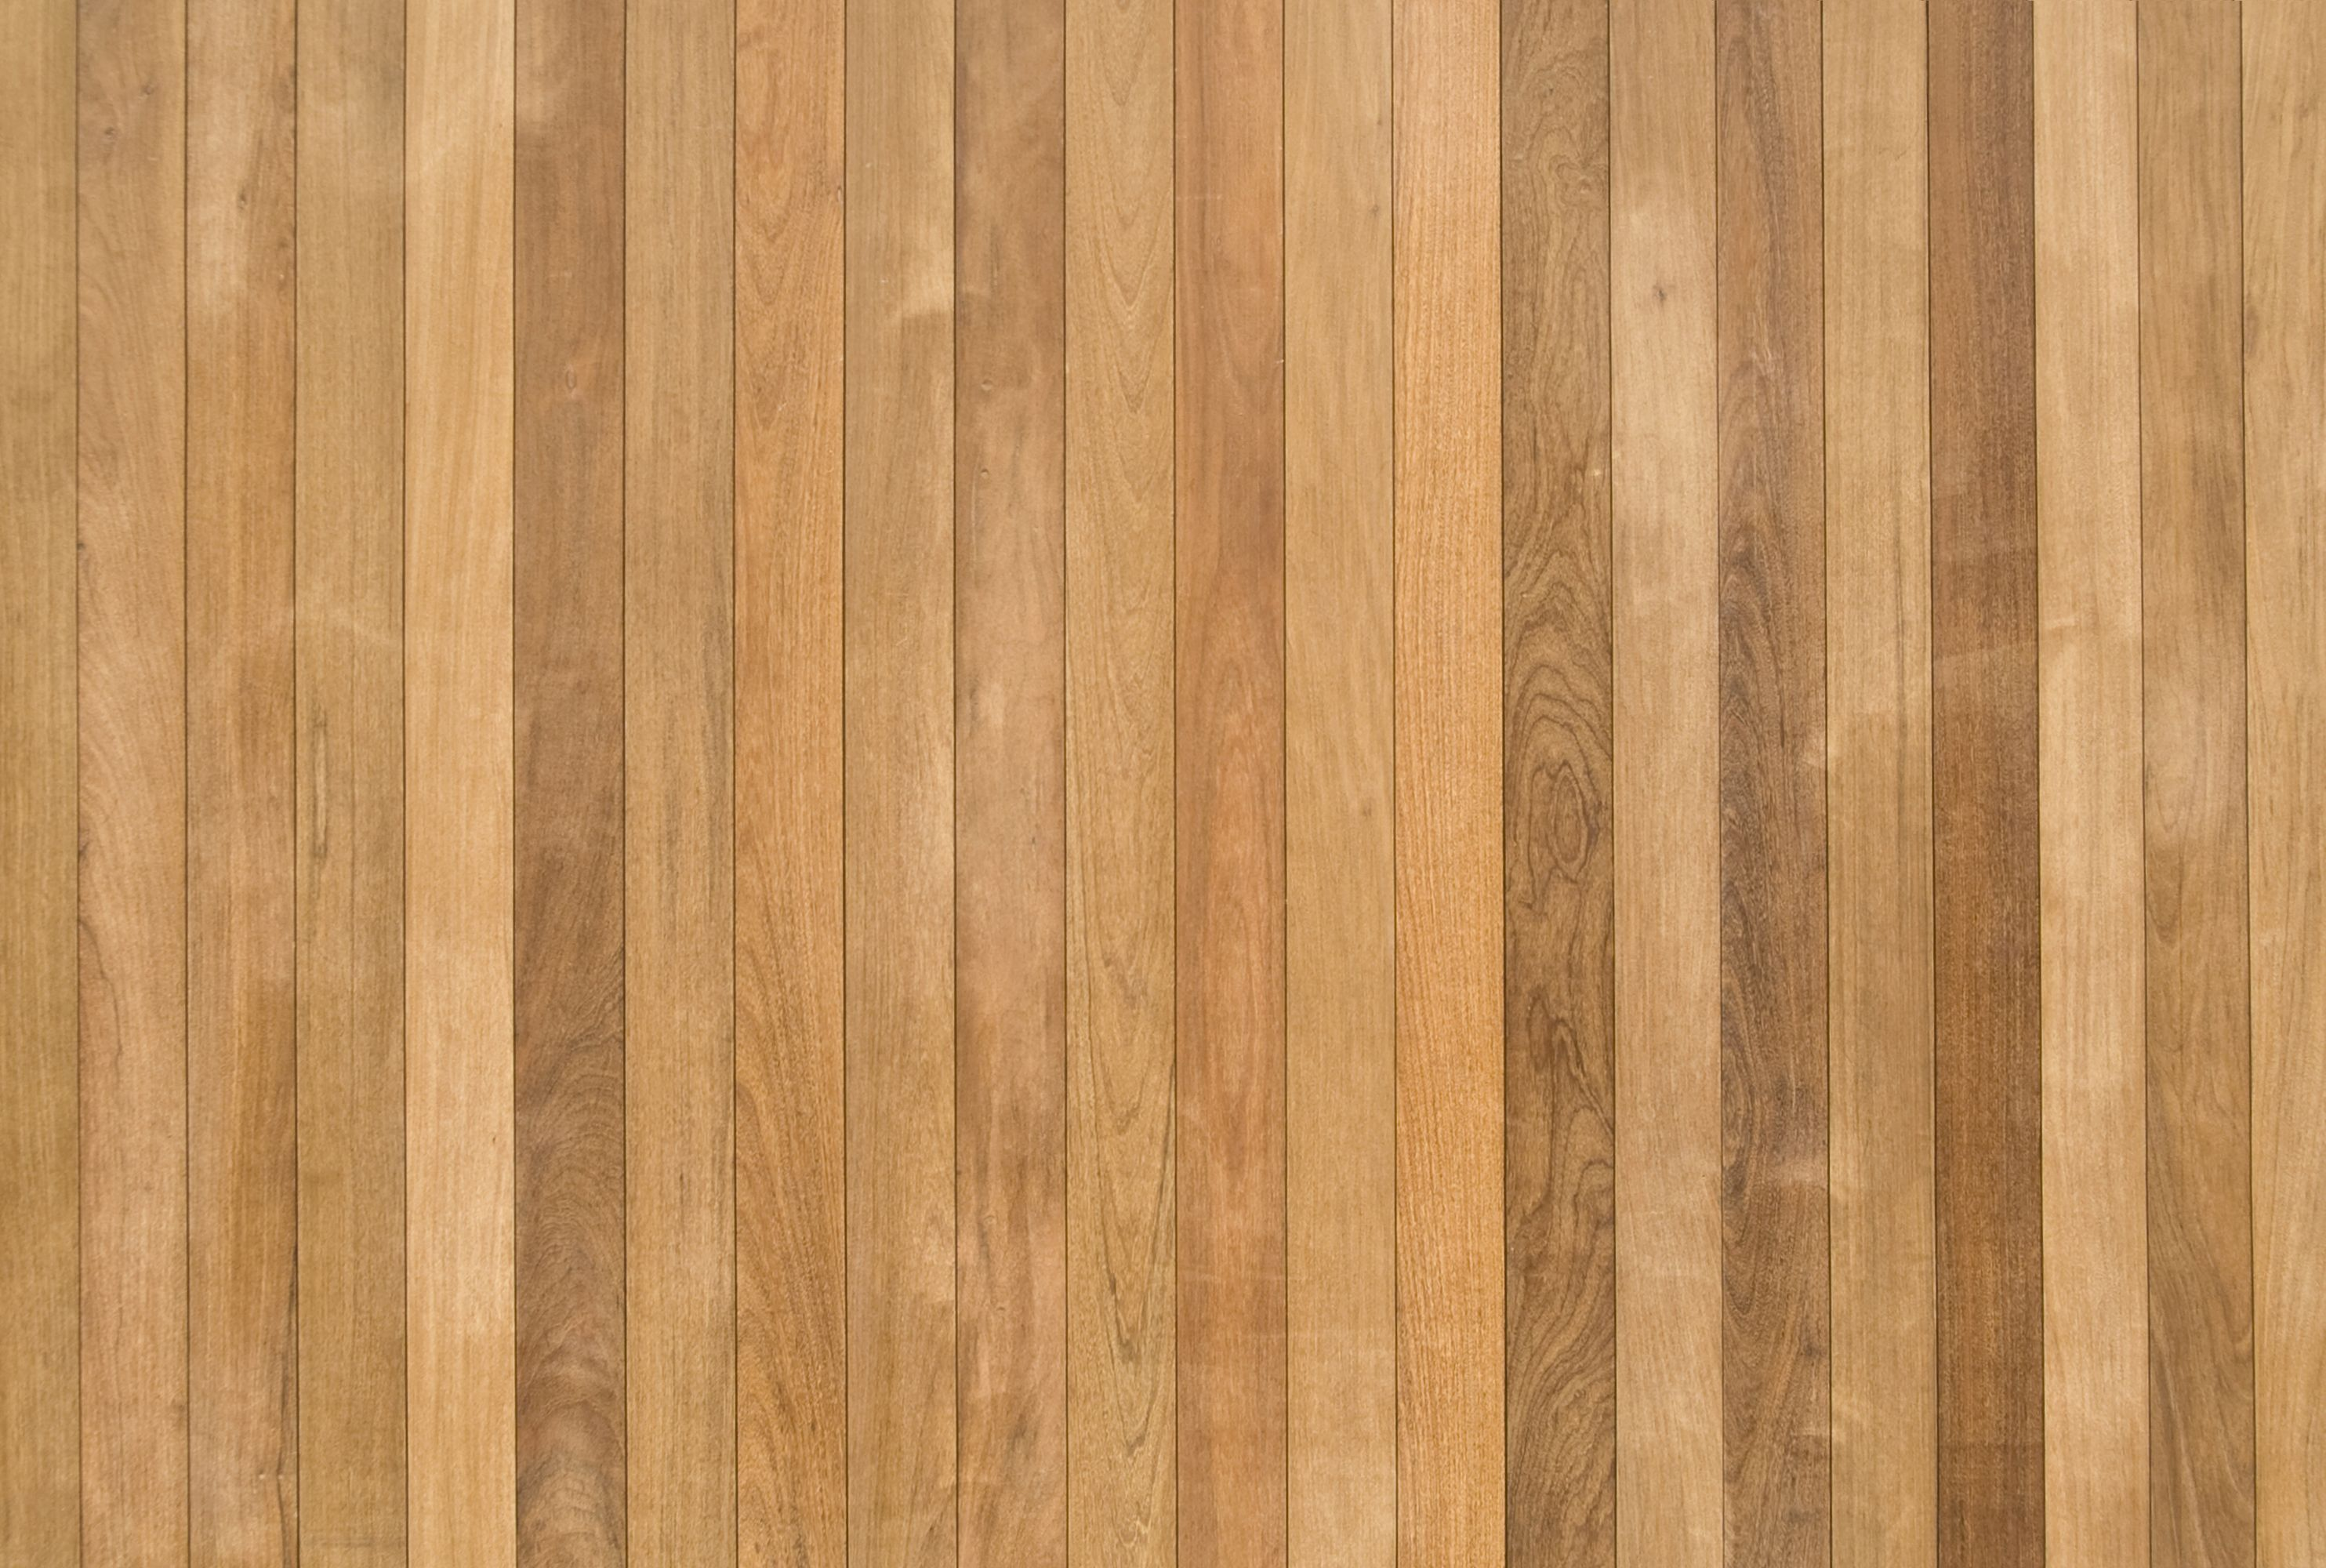 9 Exquisite Oak Wood Planks Minecraft Wiki Oak Wood Planks